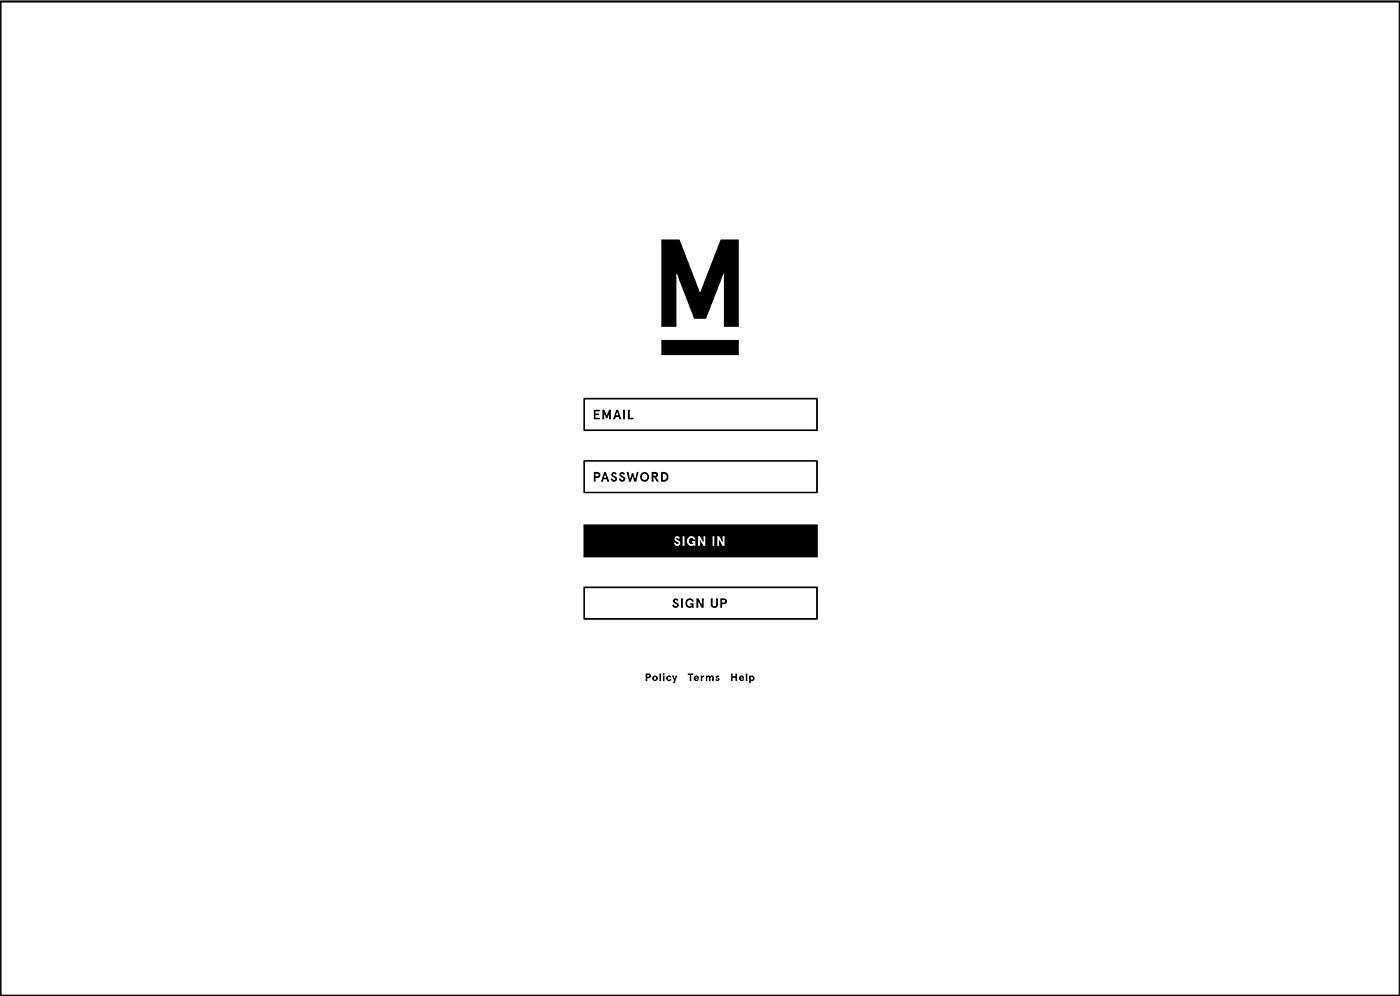 M_Email_Desktop1.jpg